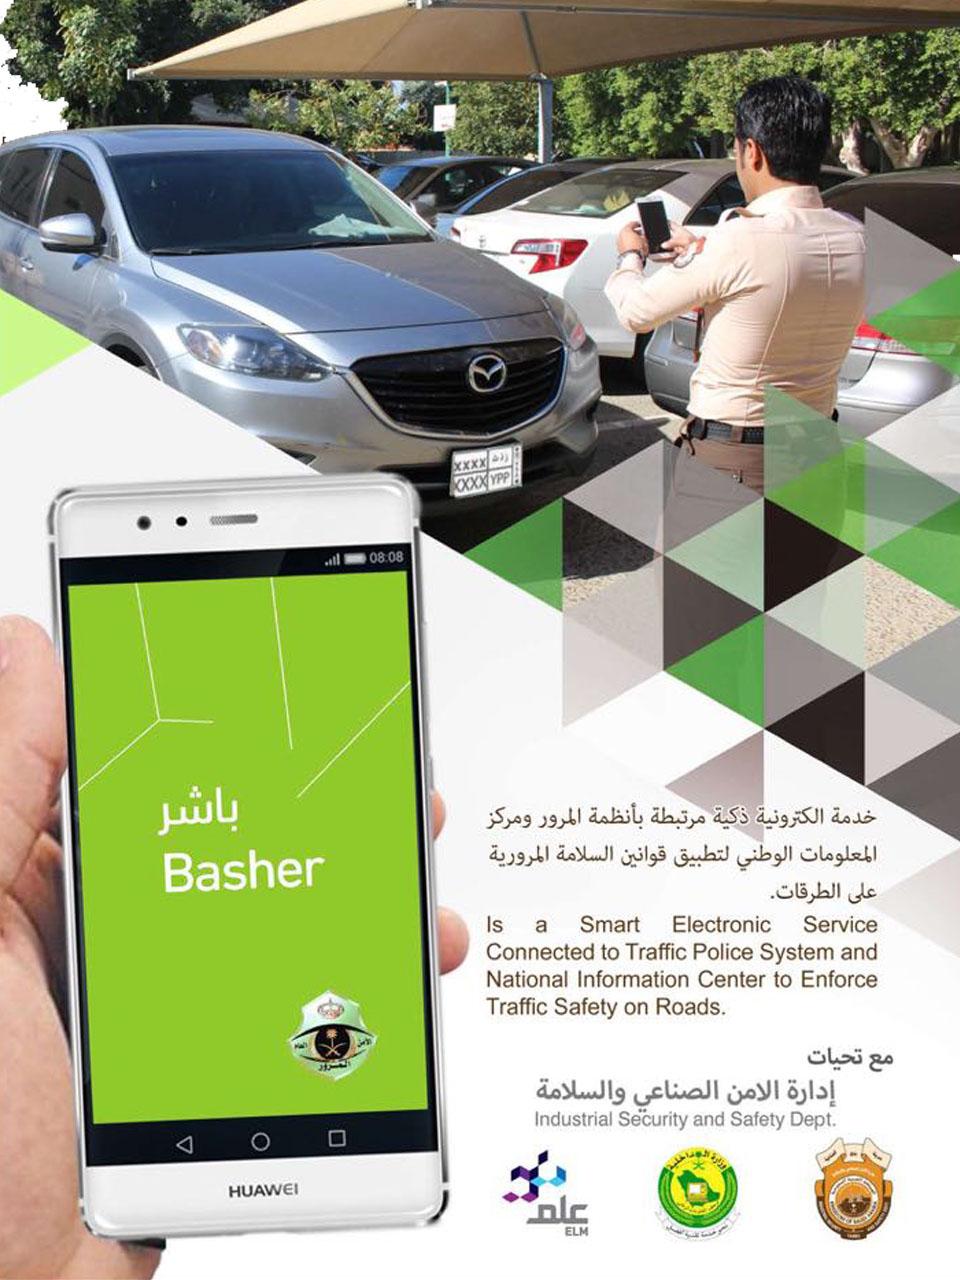 باشر basher